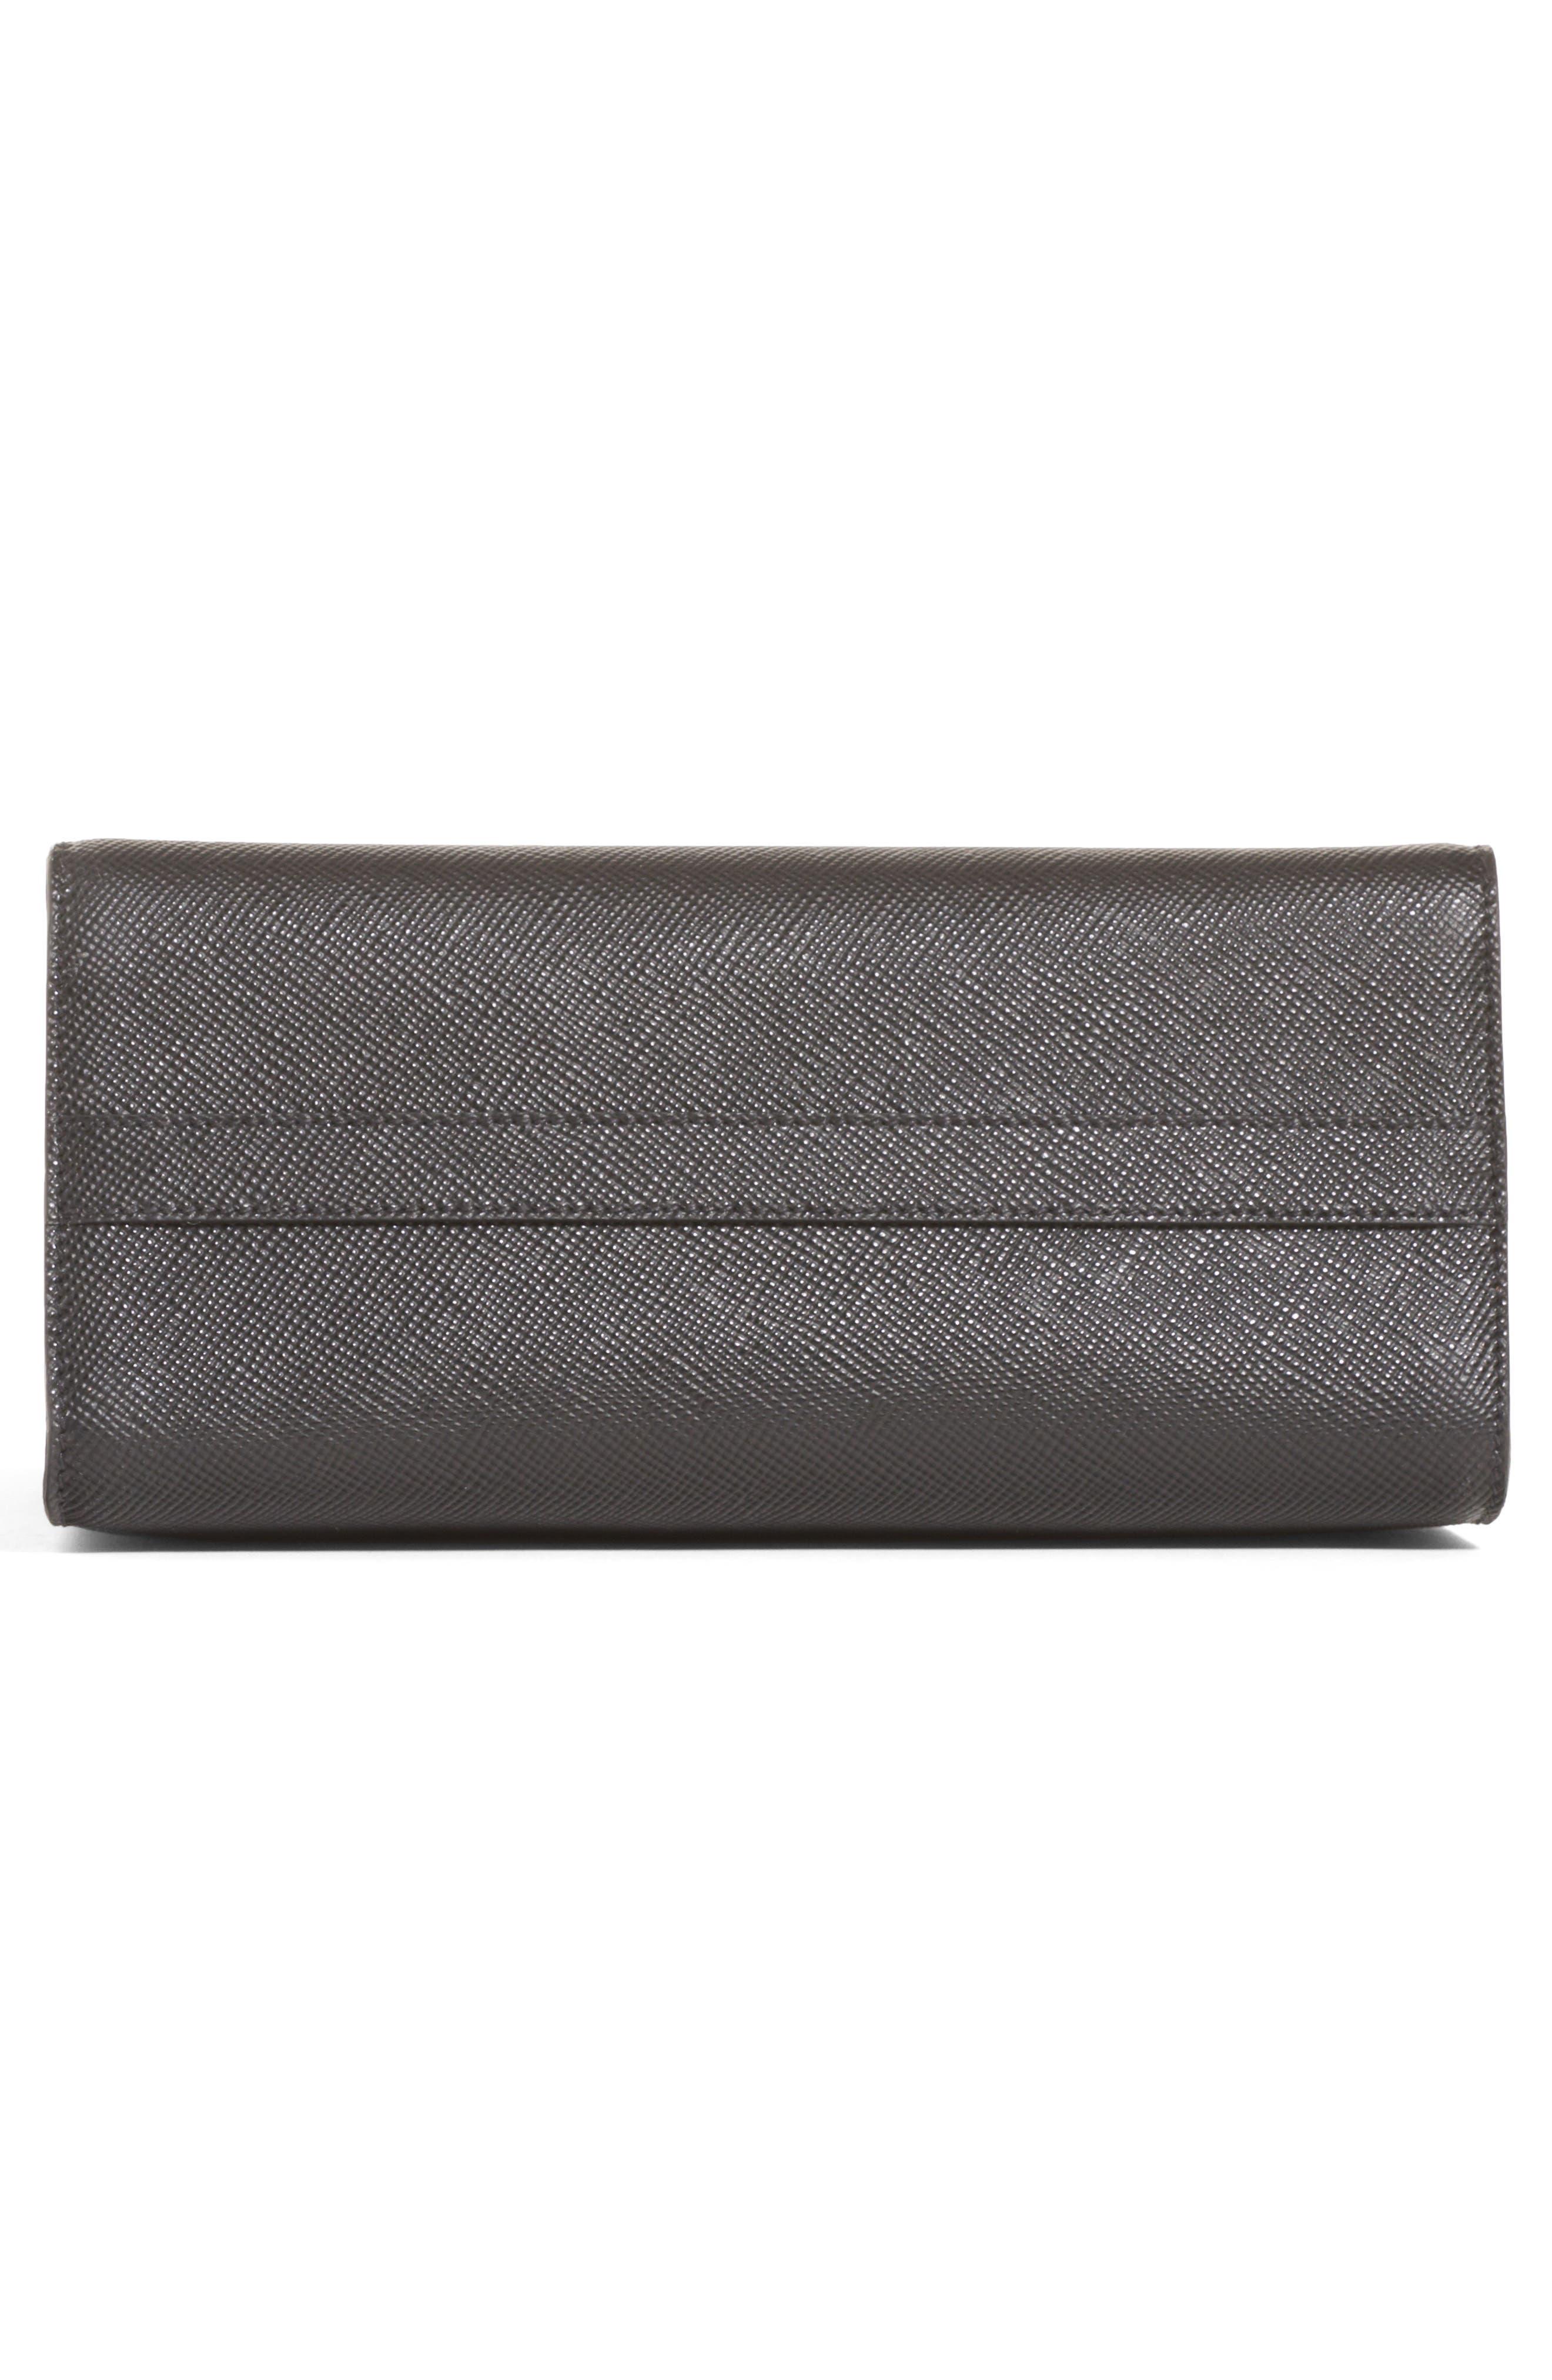 Monochrome Logo Top Handle Leather Handbag,                             Alternate thumbnail 5, color,                             NERO